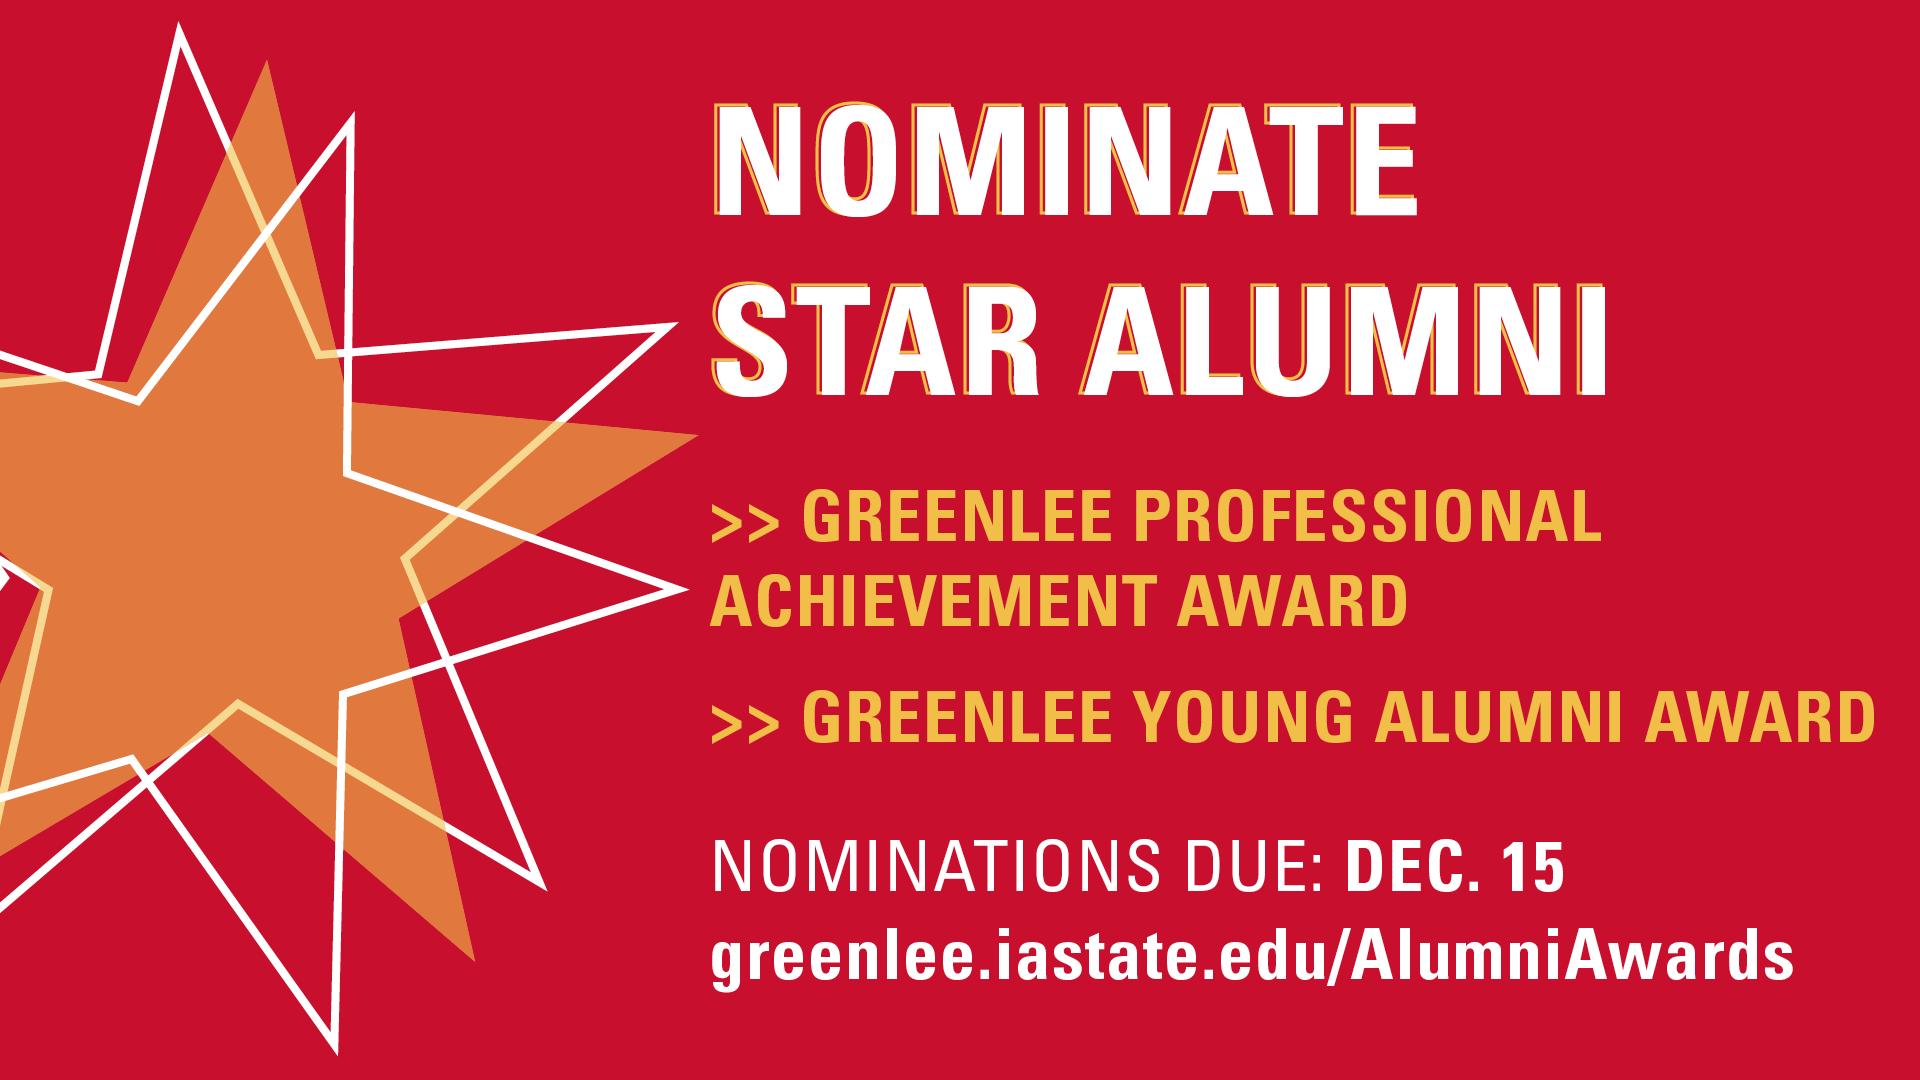 Nominate Star Alumni by Dec. 15, 2021